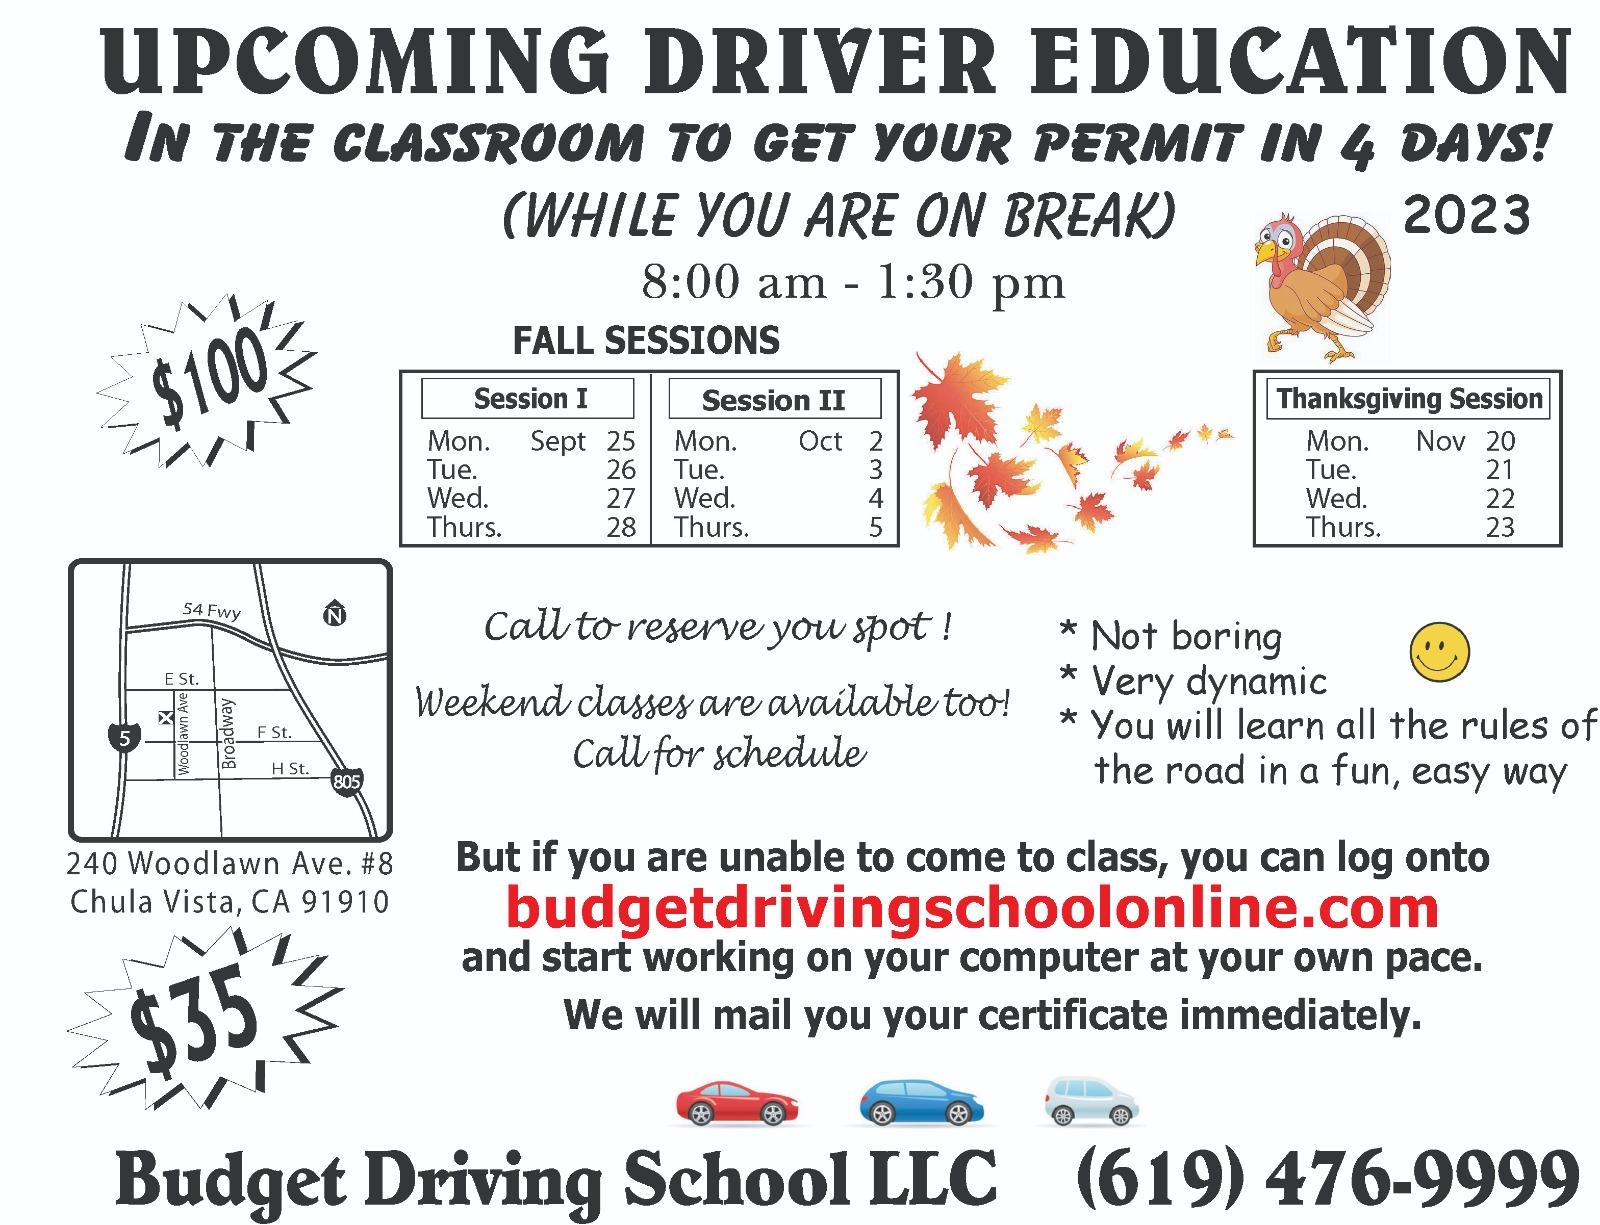 Drivered Classroom Budget Drivingschool